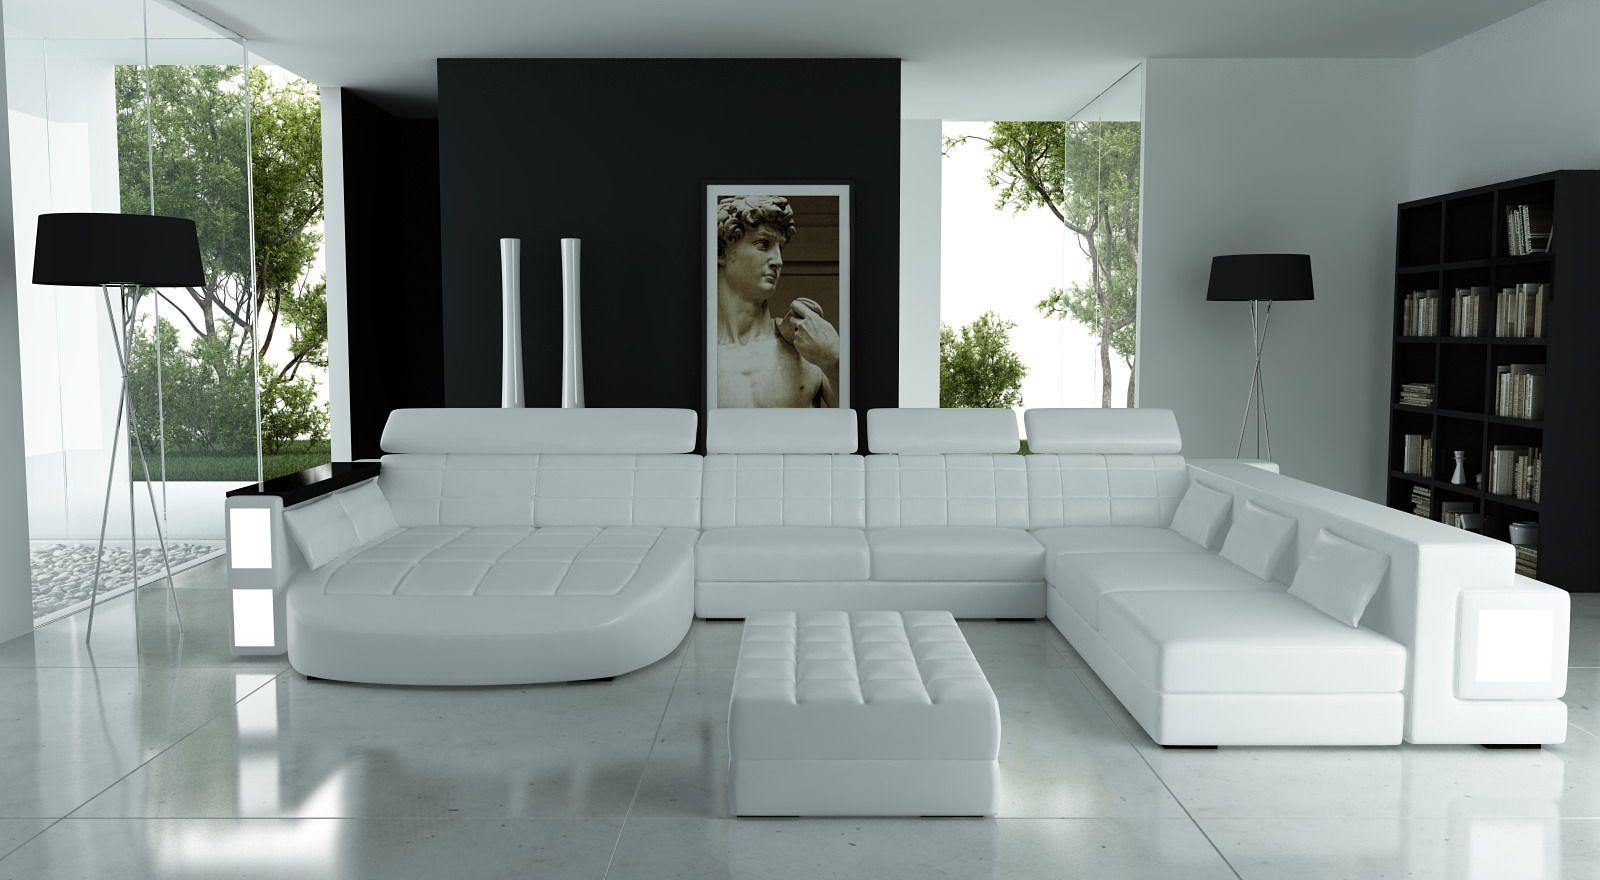 Hoekbank Design Leer.Lounge Design Hoekbank